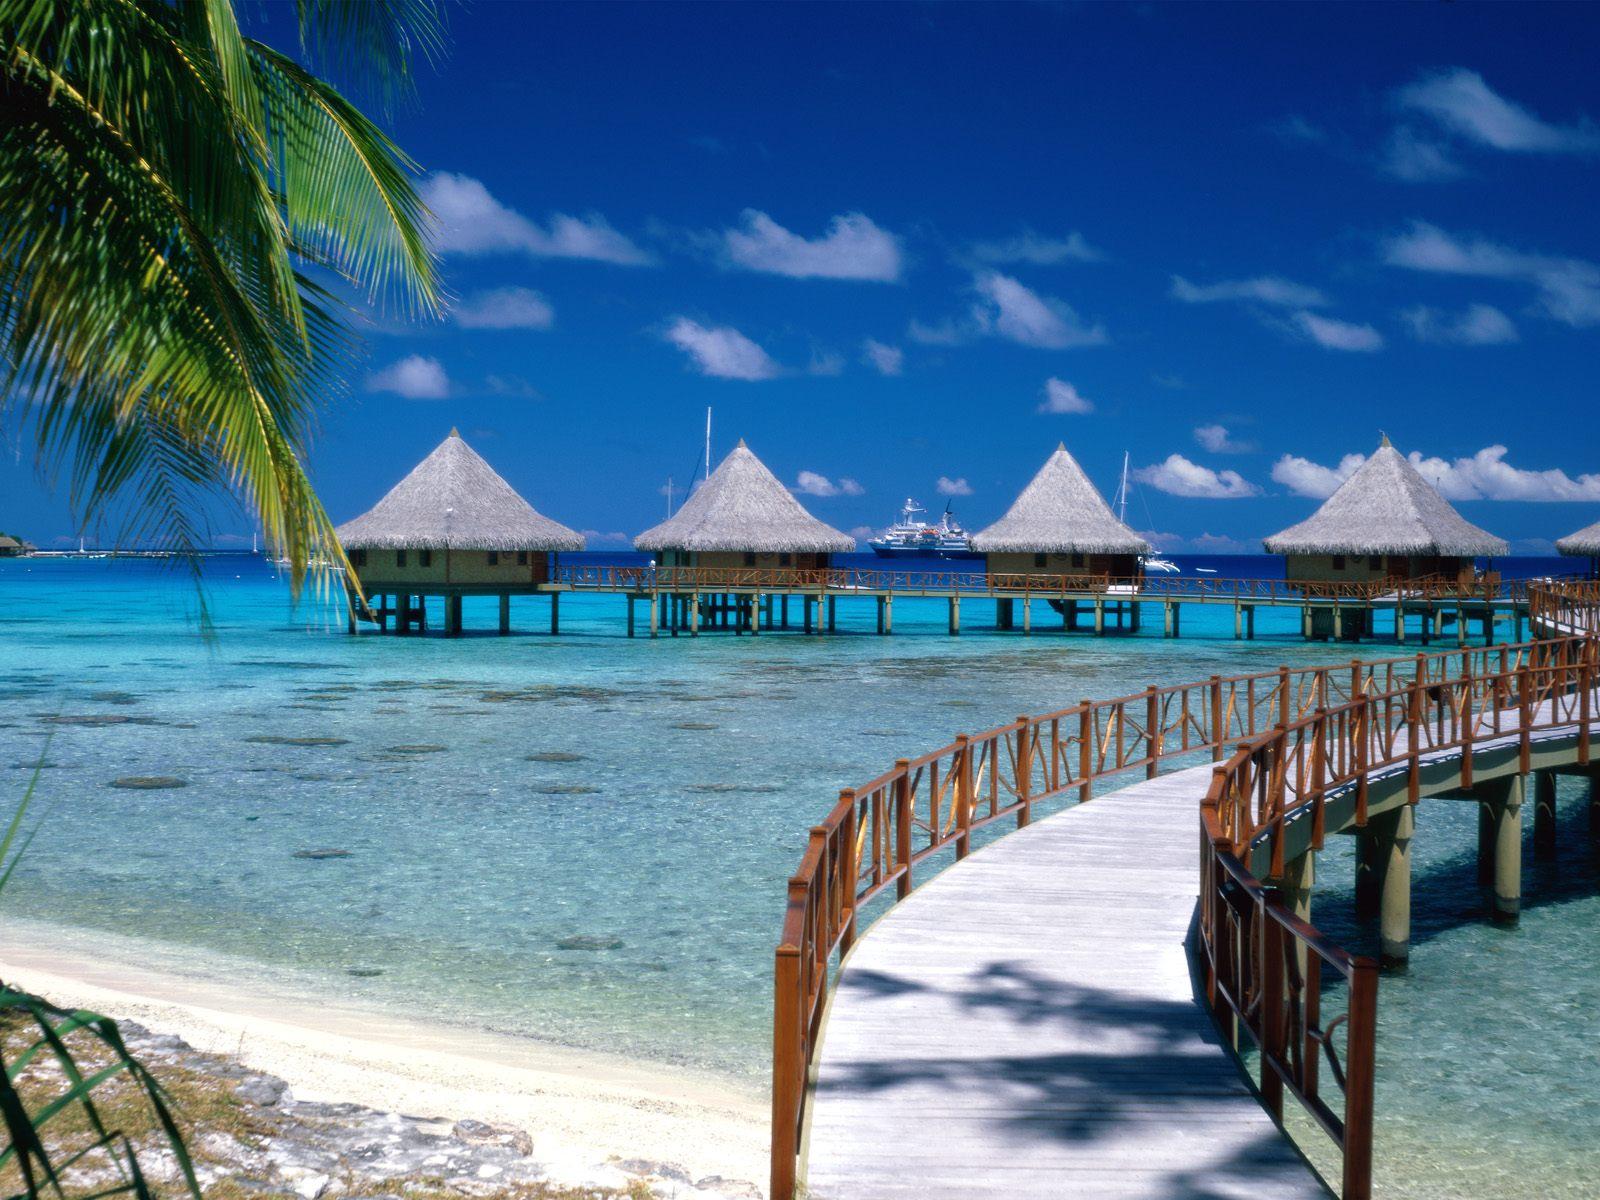 http://4.bp.blogspot.com/_BFYlnQUsPgo/TRjj1PZlFeI/AAAAAAAABKs/Up0jblaAl-Y/s1600/Mac+Beach+Travel+Pics+Beach+Destinations.jpg